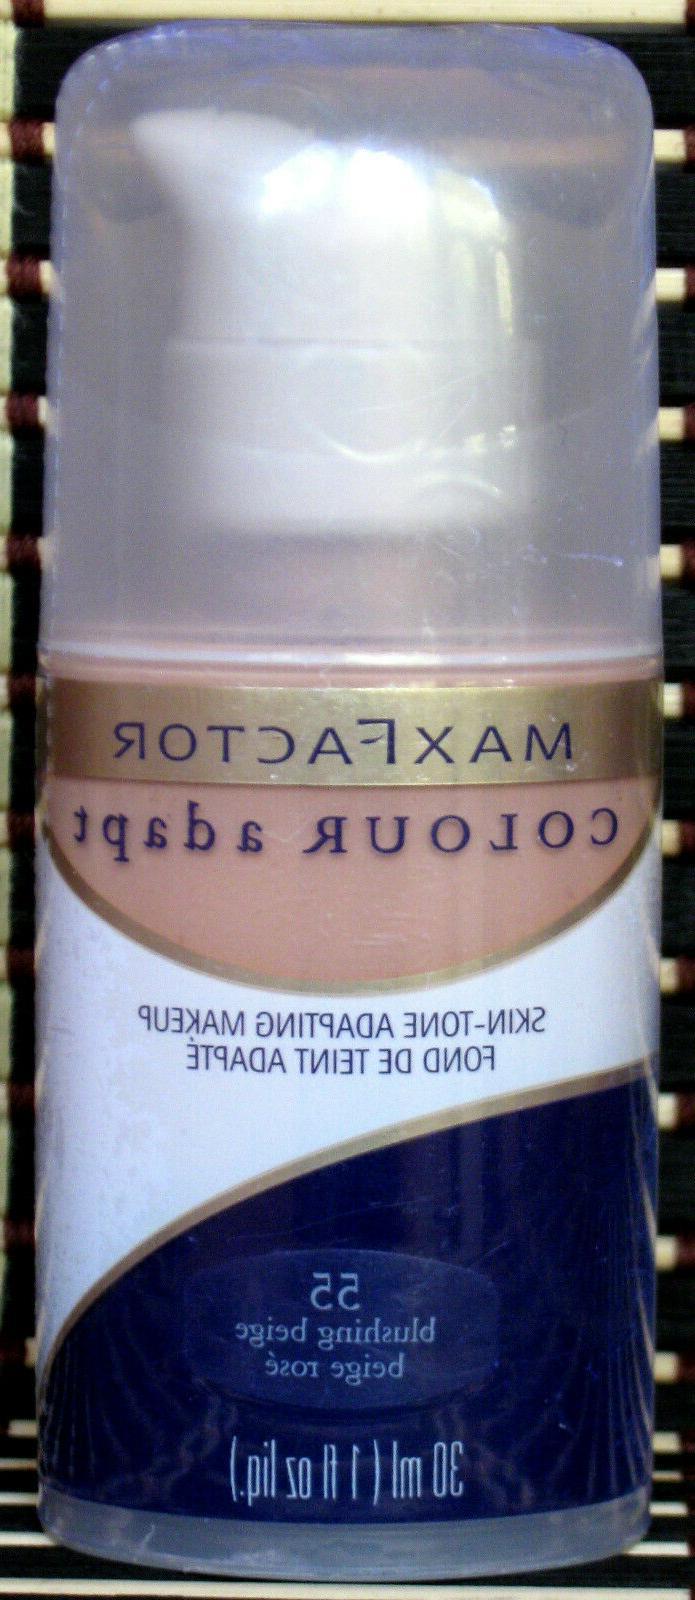 Max Factor Colour Adap Skin Tone Adapting Makeup #55 BLUSHIN